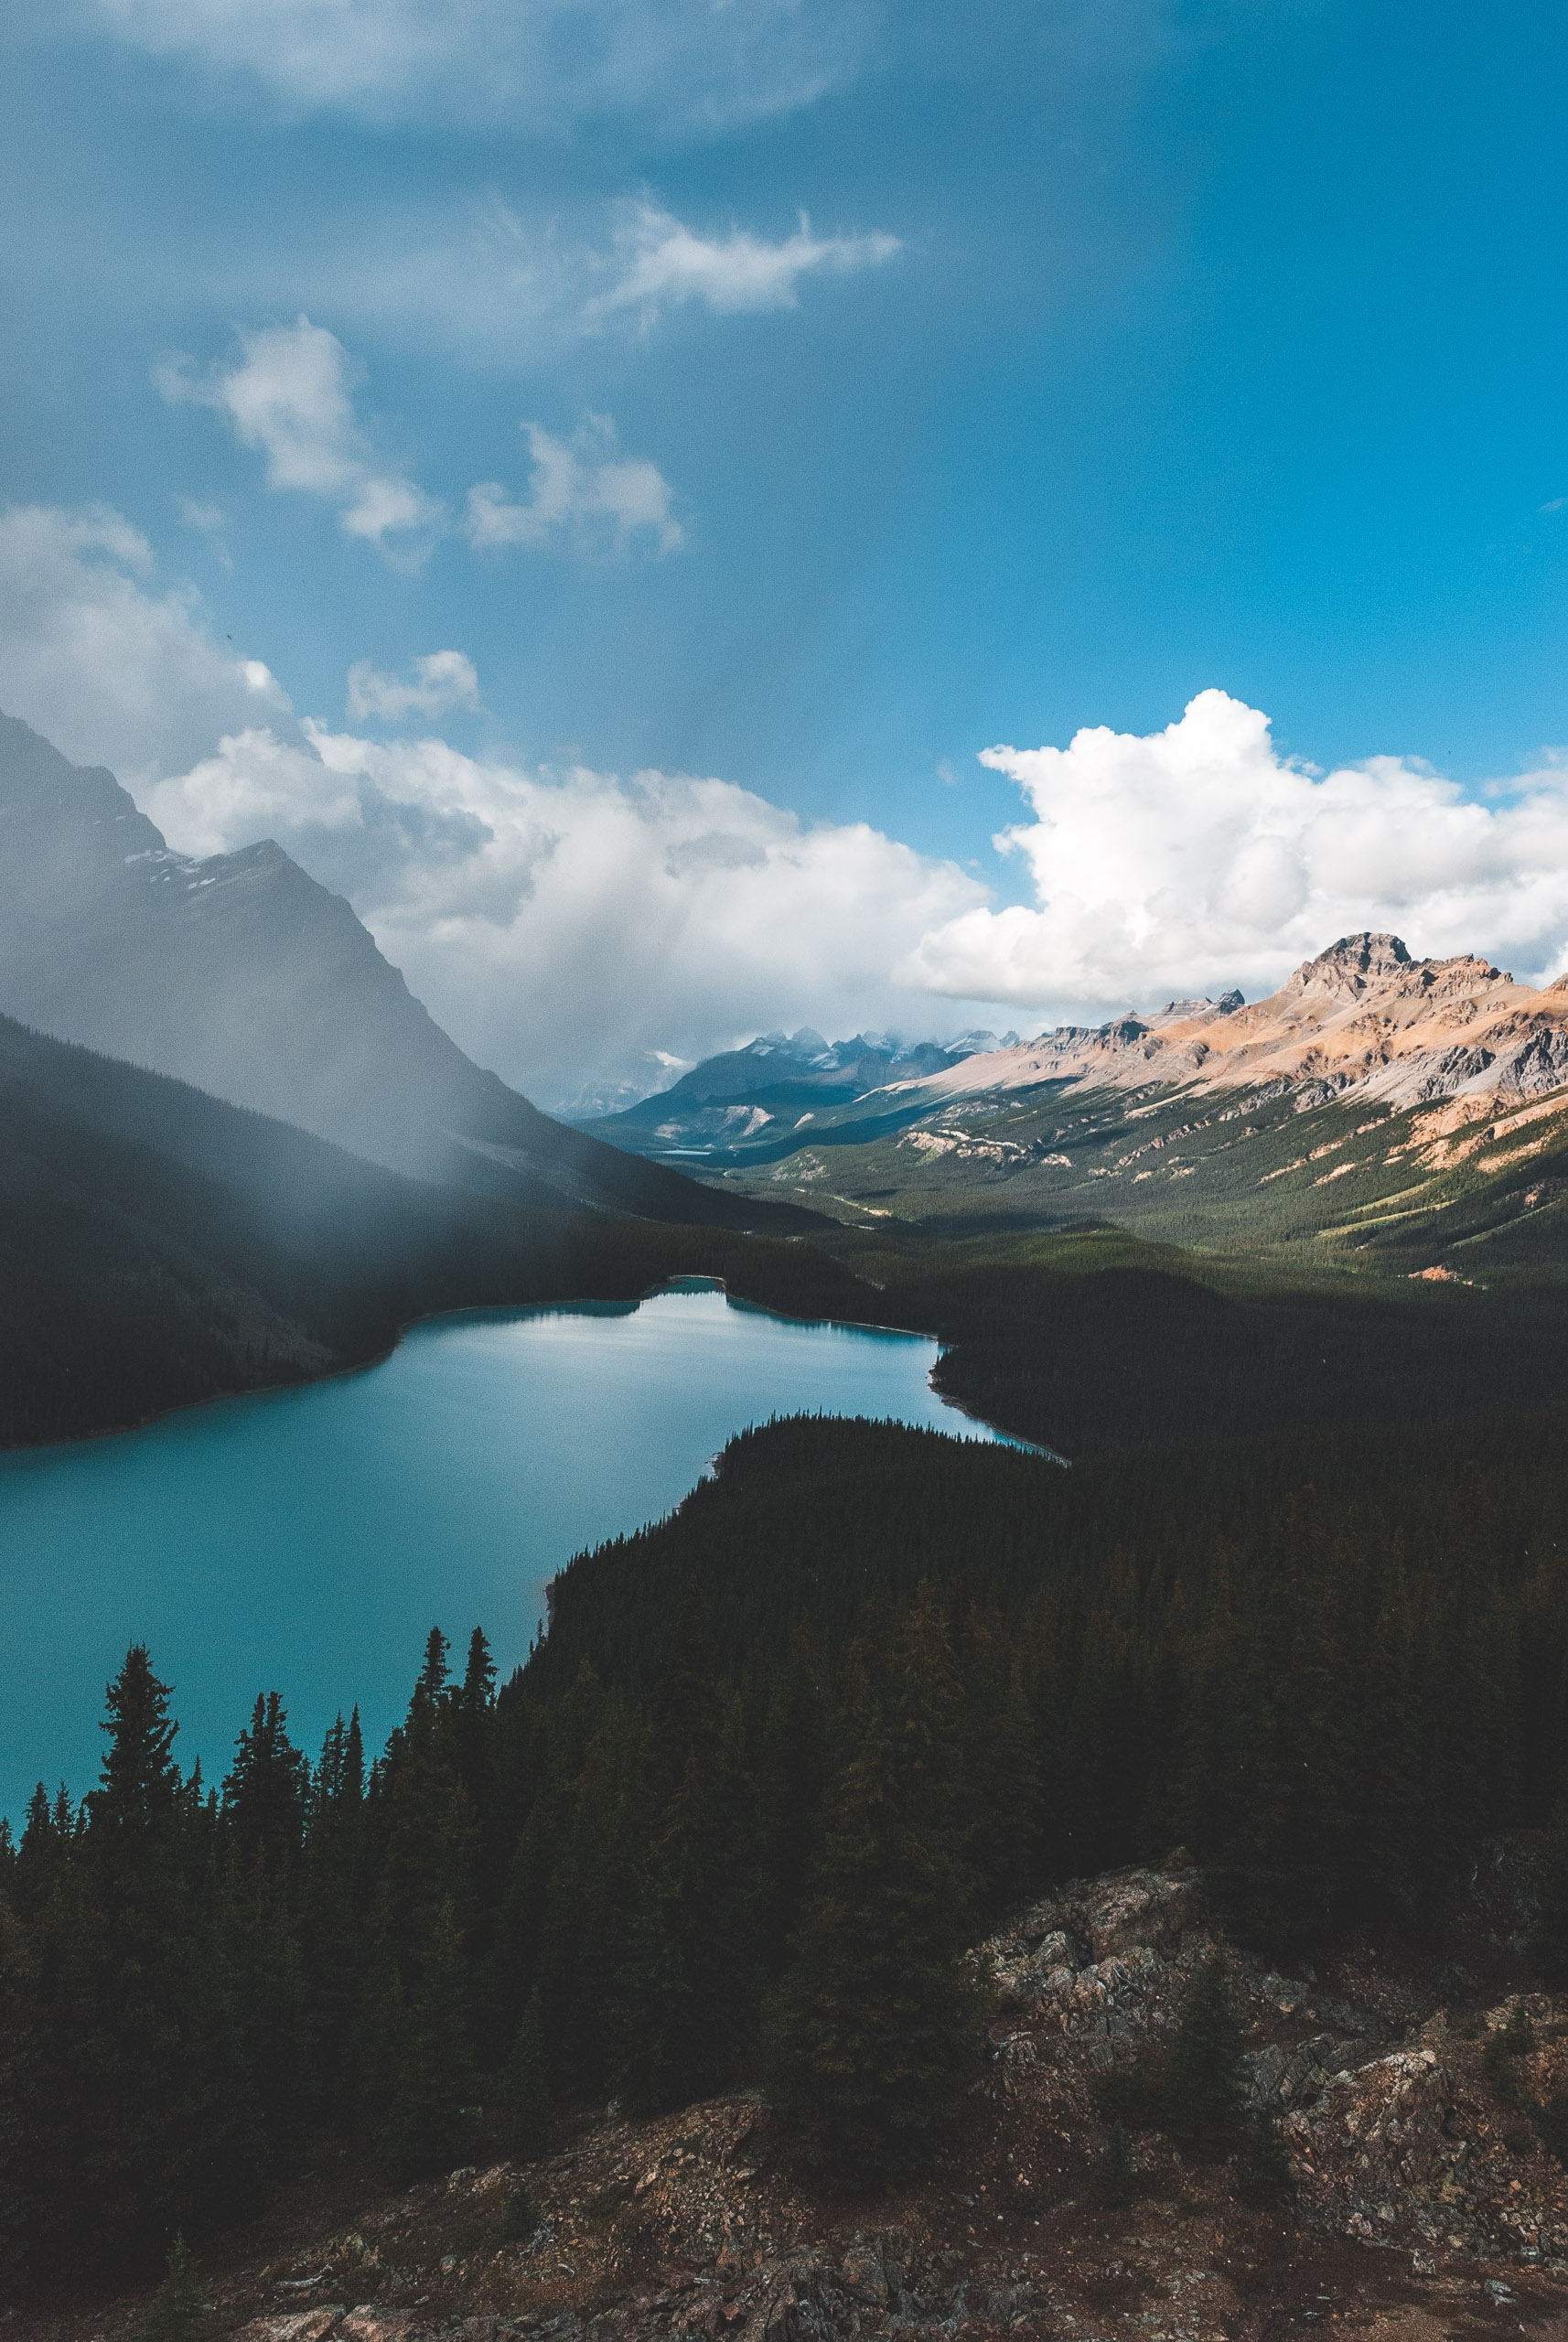 Banff National Park - 2007-0908-DSC_0075_73535